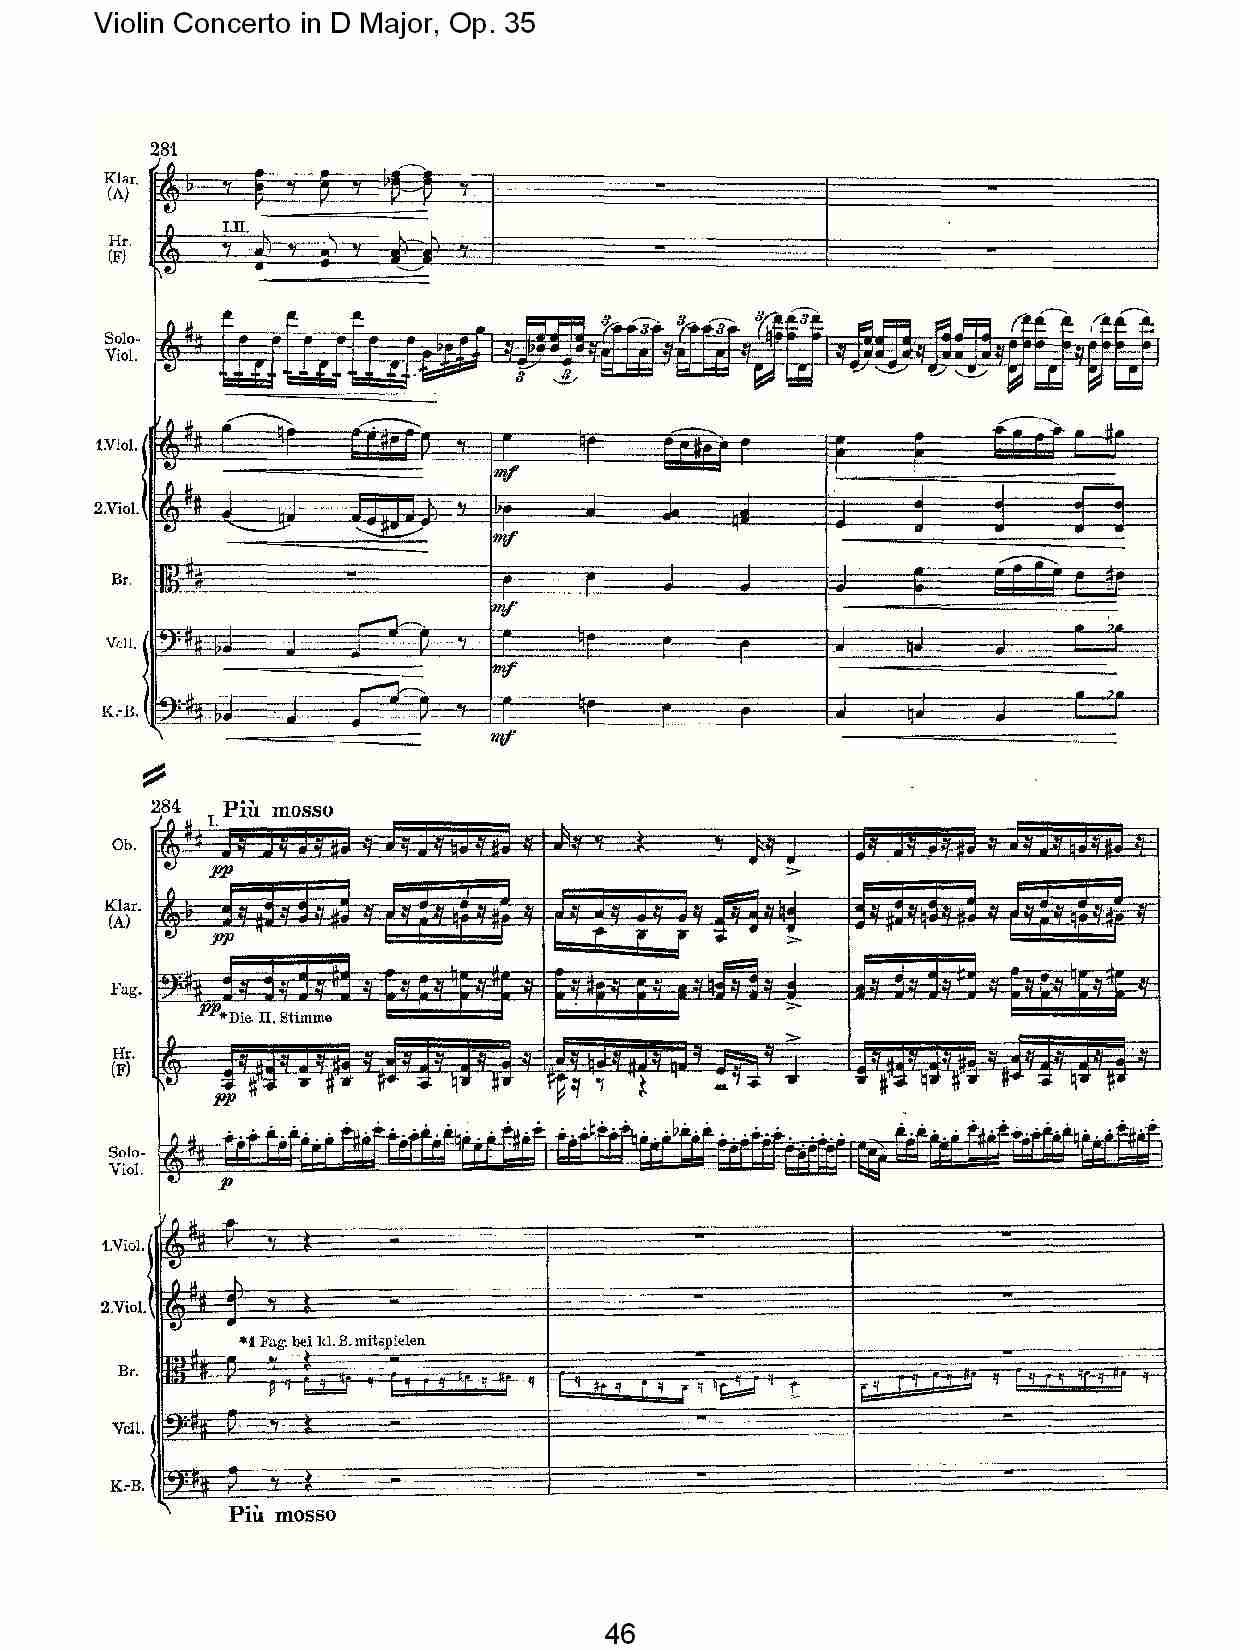 d大调小提琴协奏曲, op.35第一乐章(十)